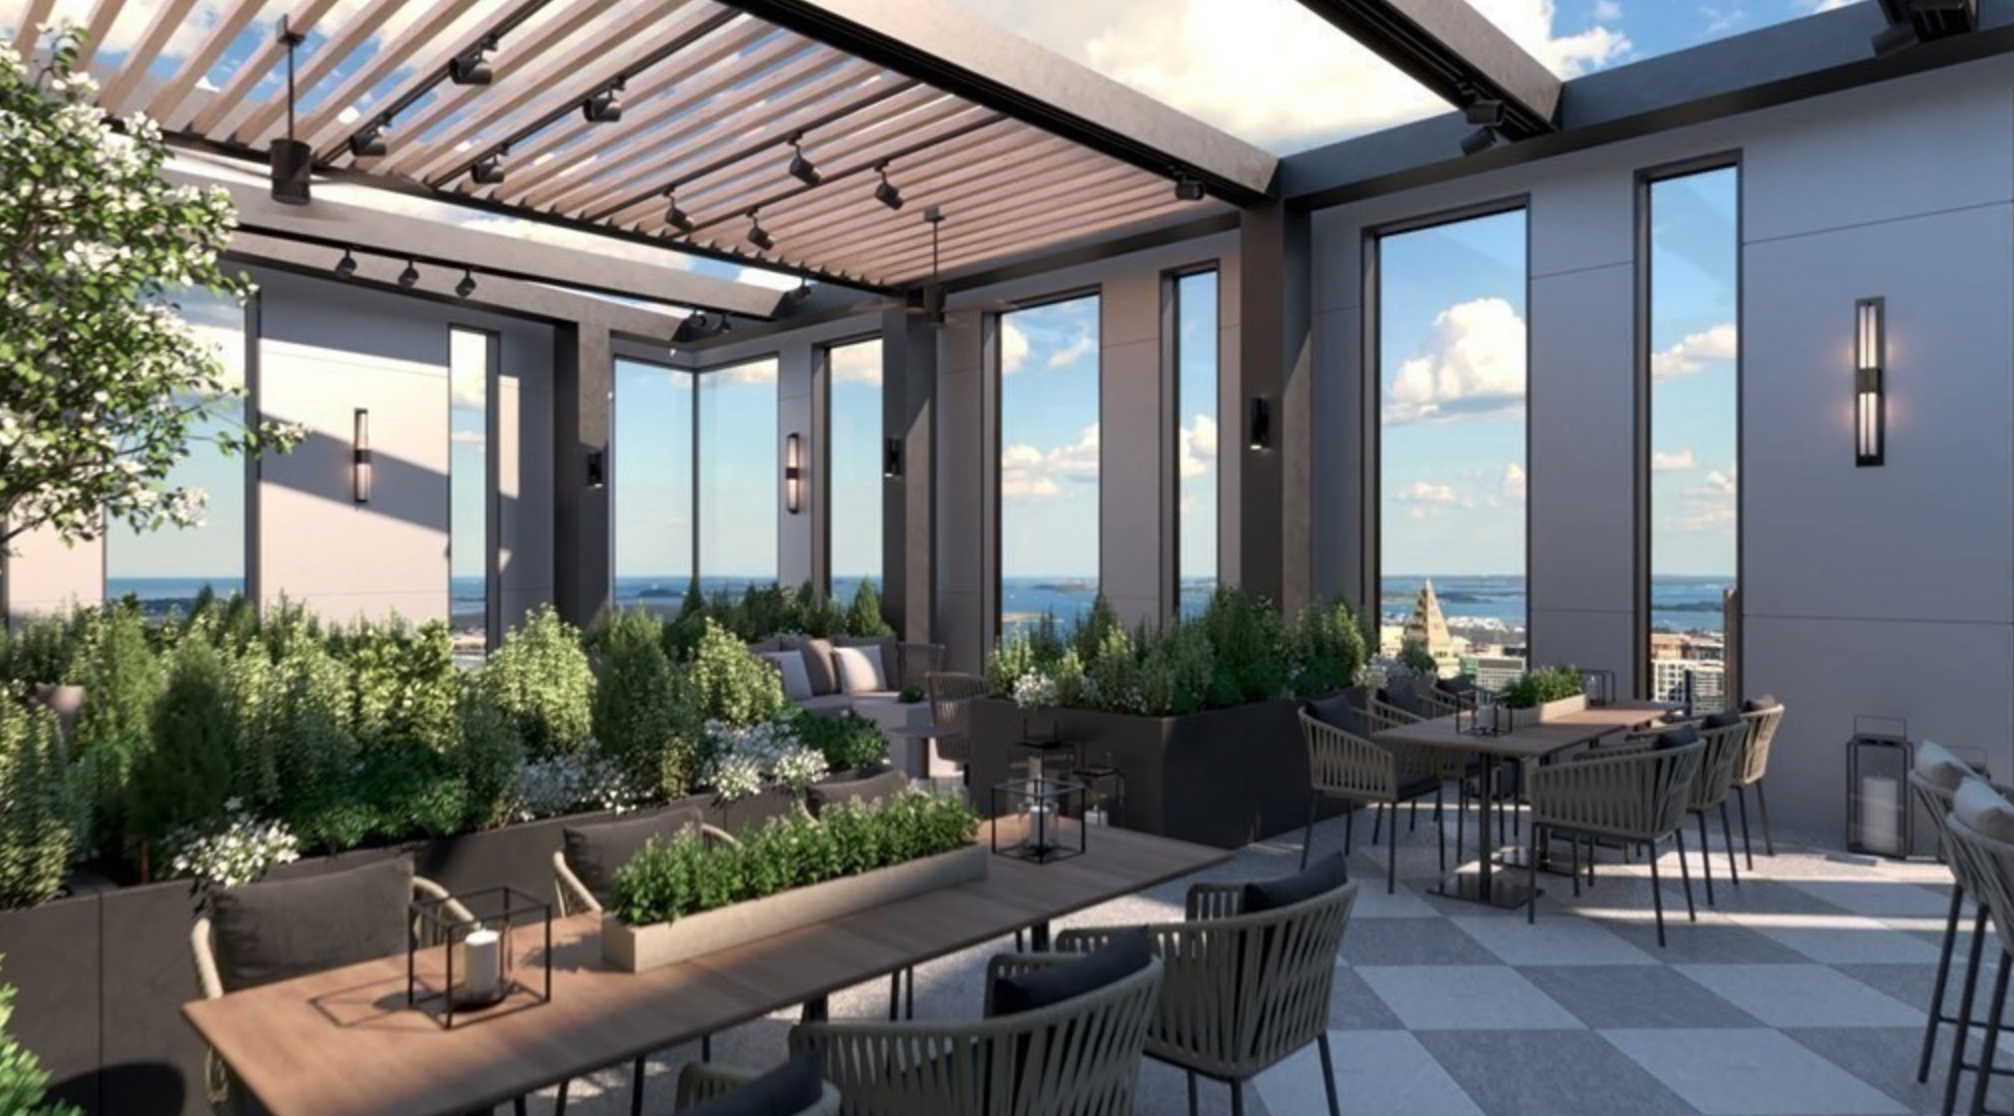 The Sudbury Garden Terrace